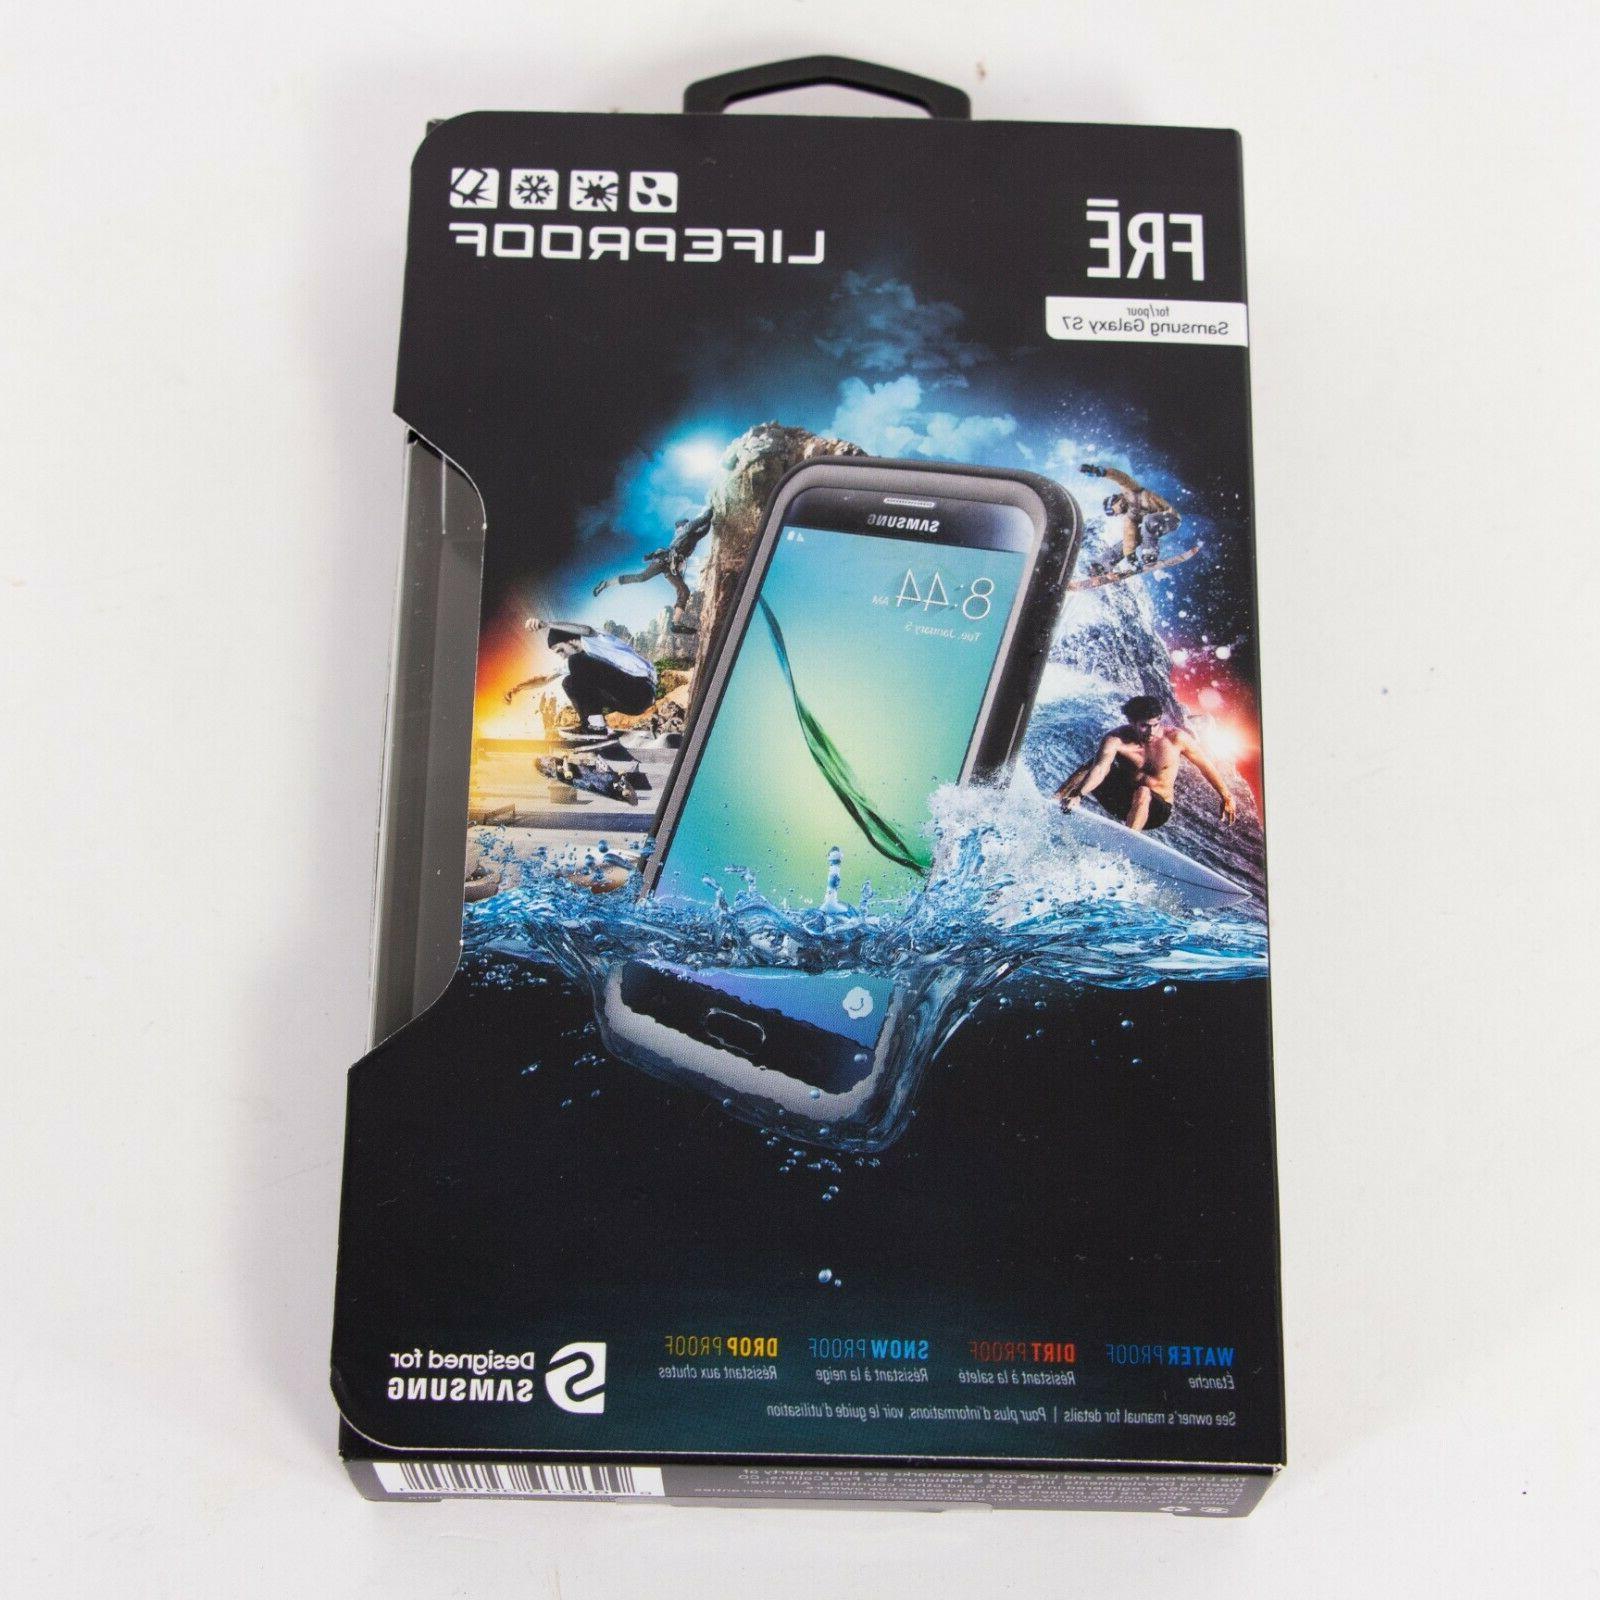 77 53322 fre series waterproof case